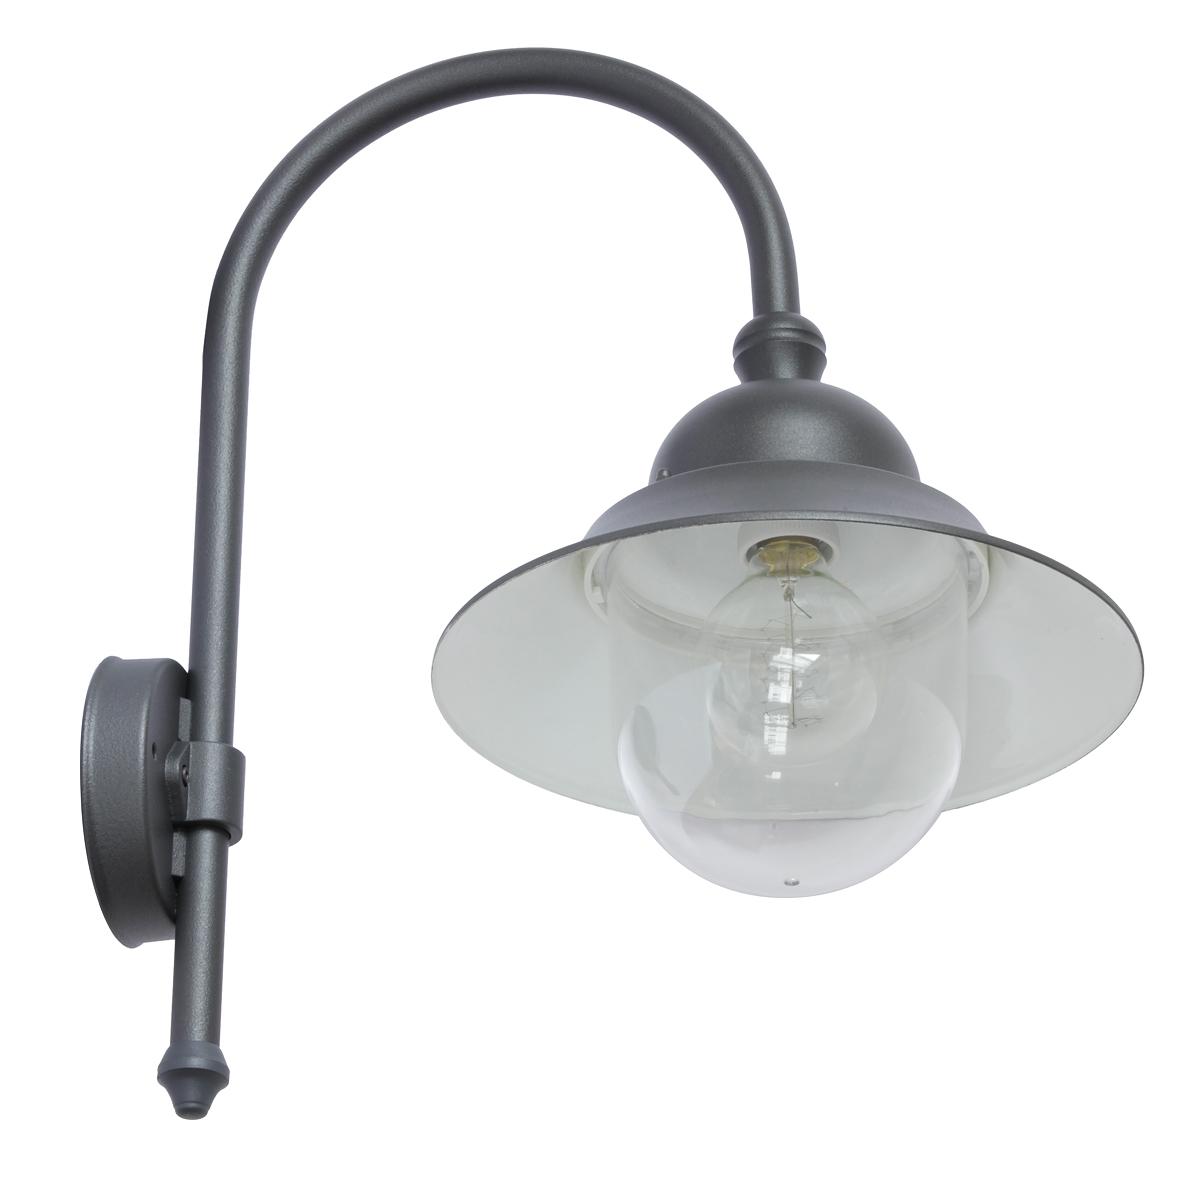 wandlampe f r au en mit industriestil schirm terra lumi. Black Bedroom Furniture Sets. Home Design Ideas